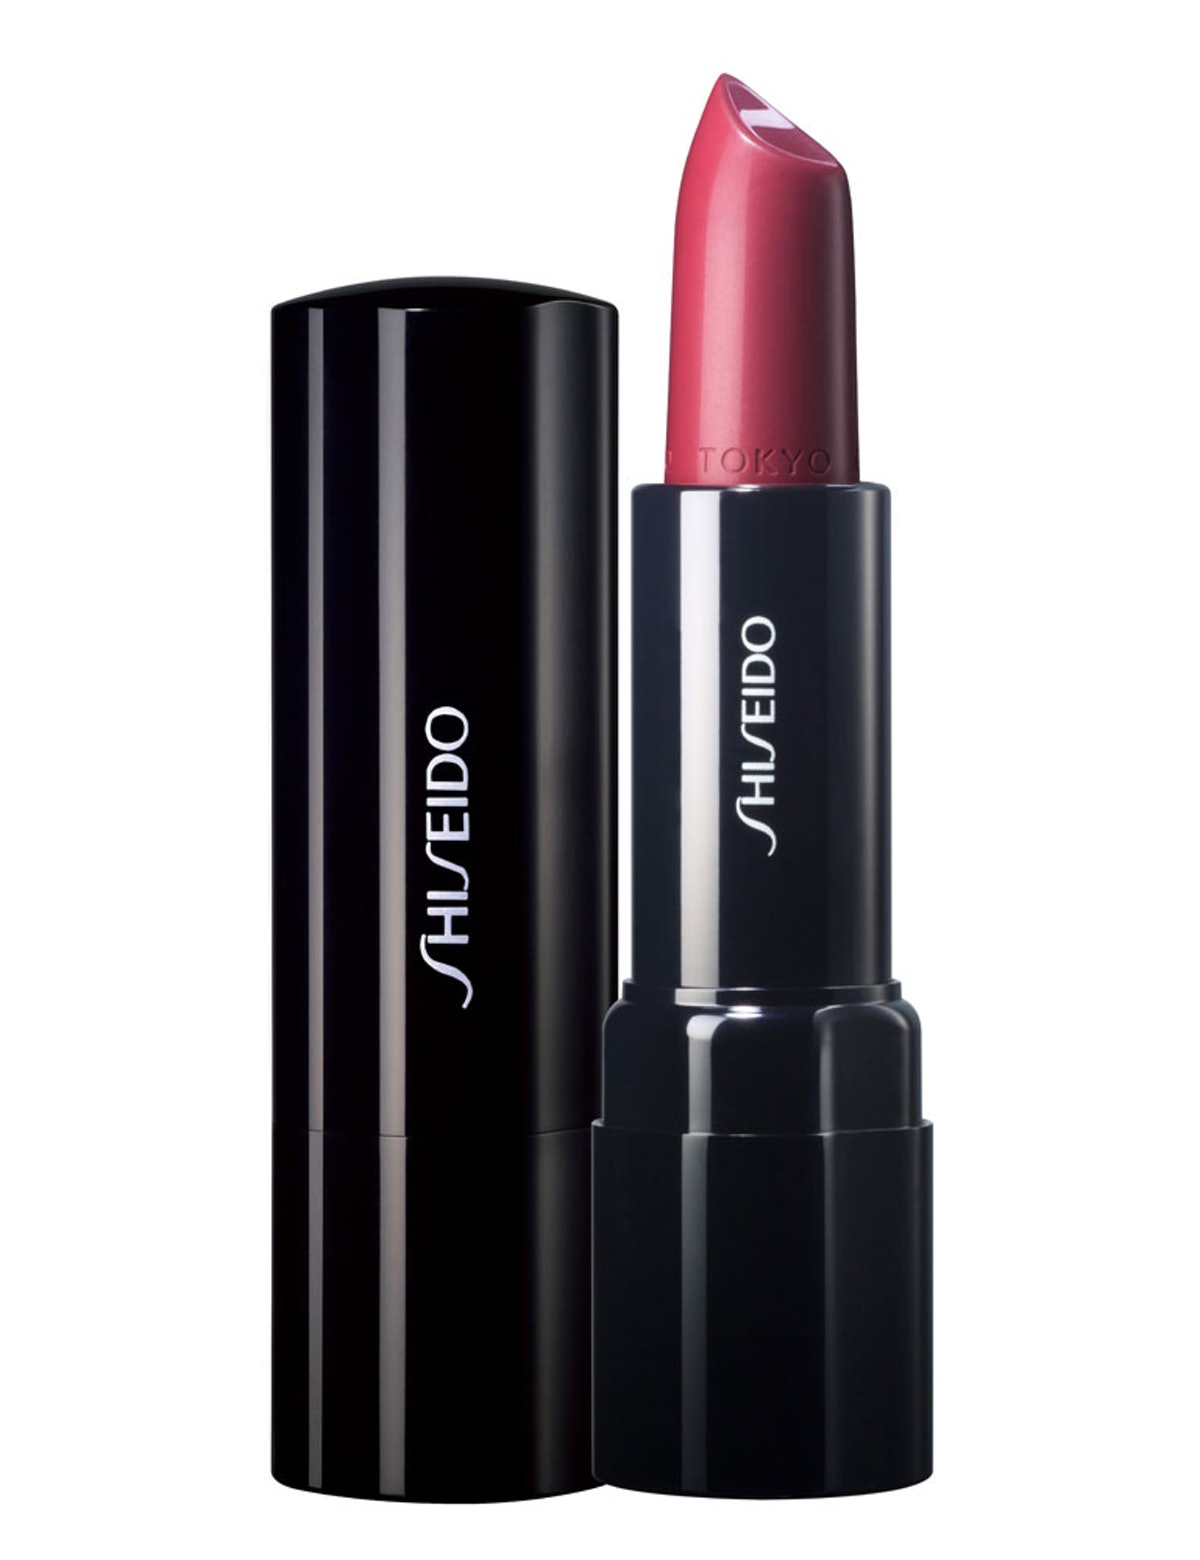 shiseido long lasting lipstick